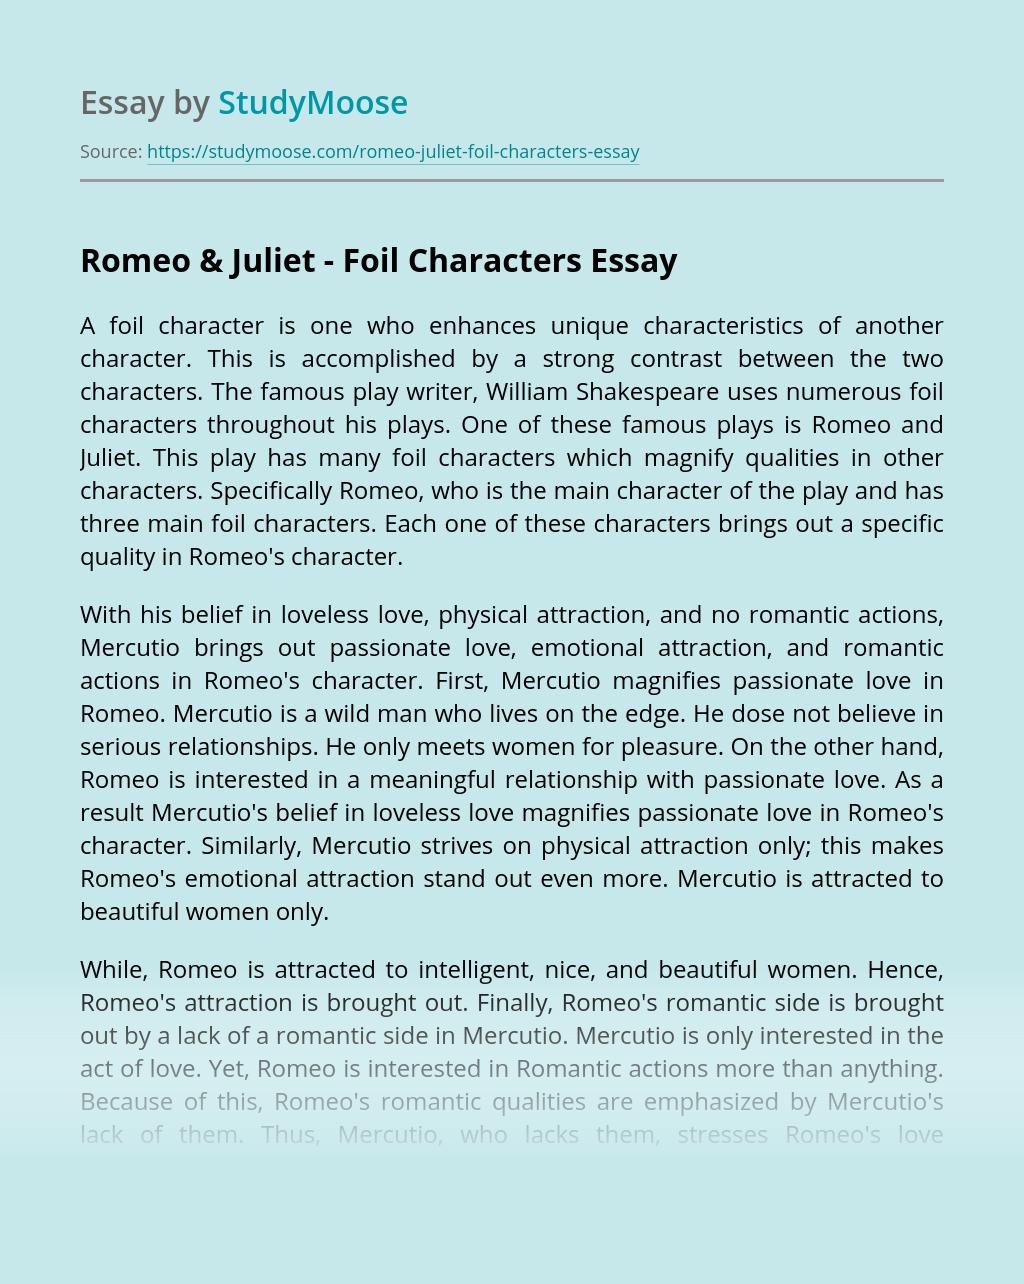 Romeo & Juliet - Foil Characters